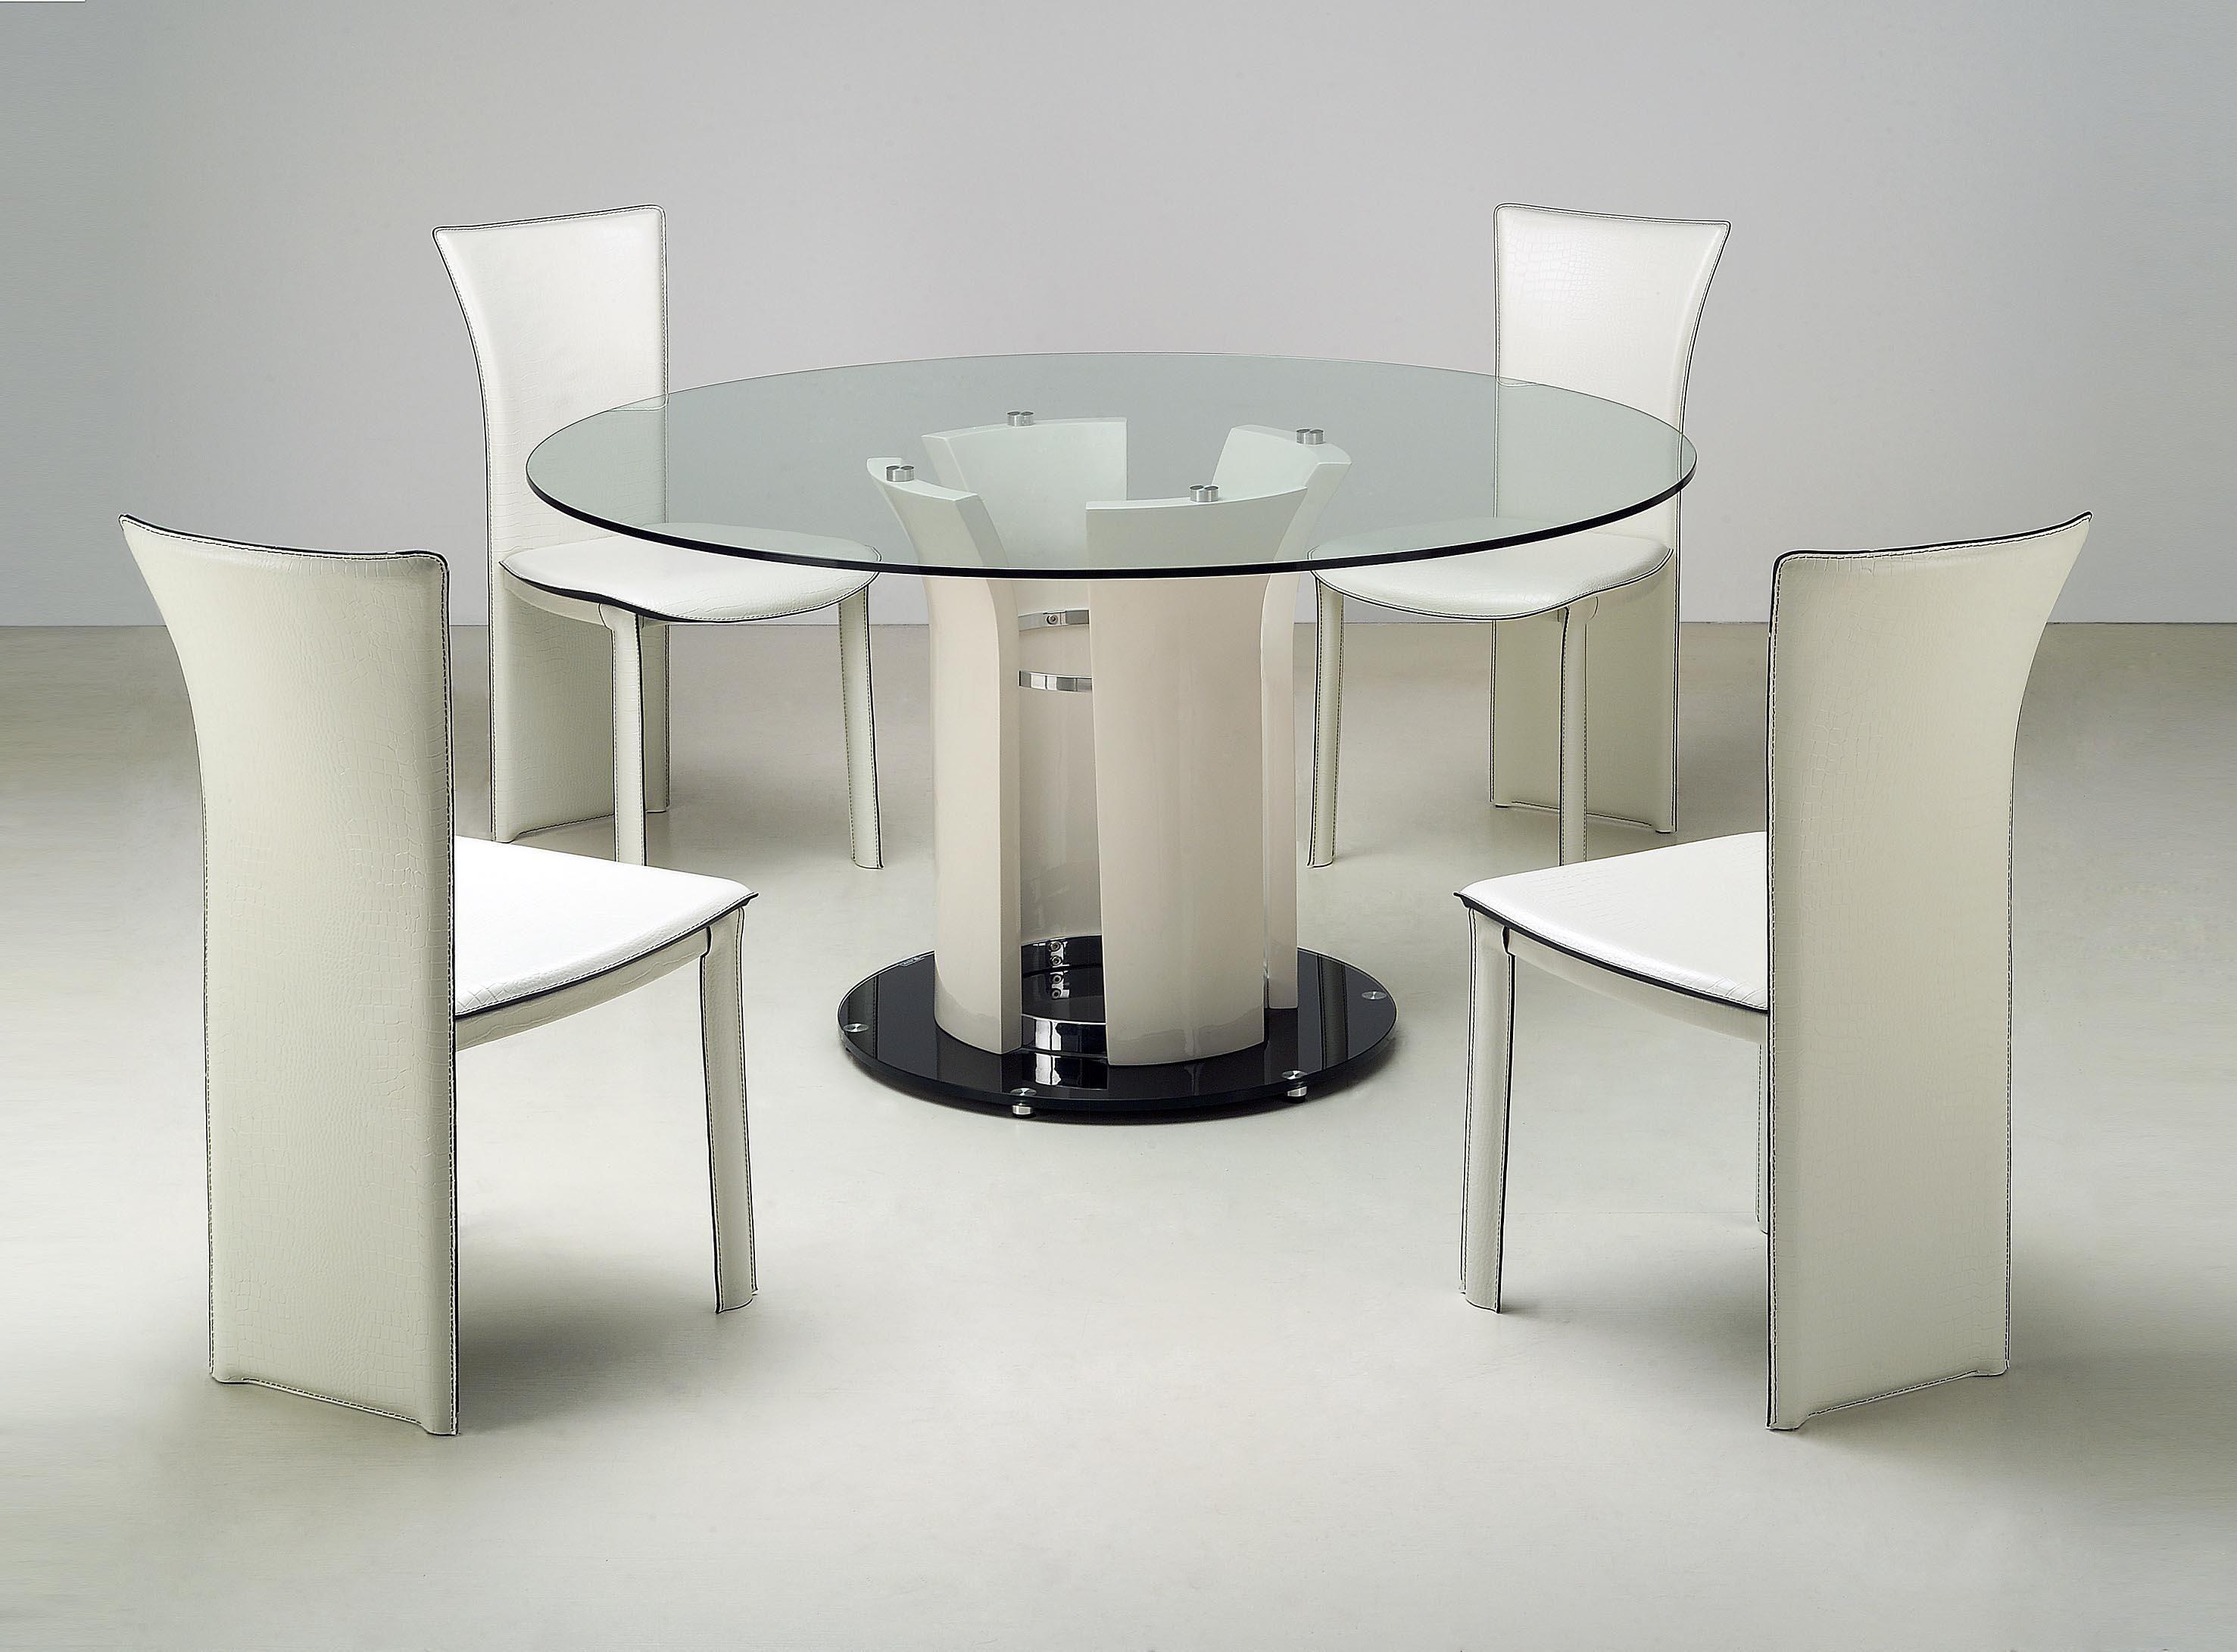 Deborah Deborah 5 Piece Dining Set By Chintaly Imports Glass Round Dining Table Modern Round Dining Room Table Glass Dining Room Table